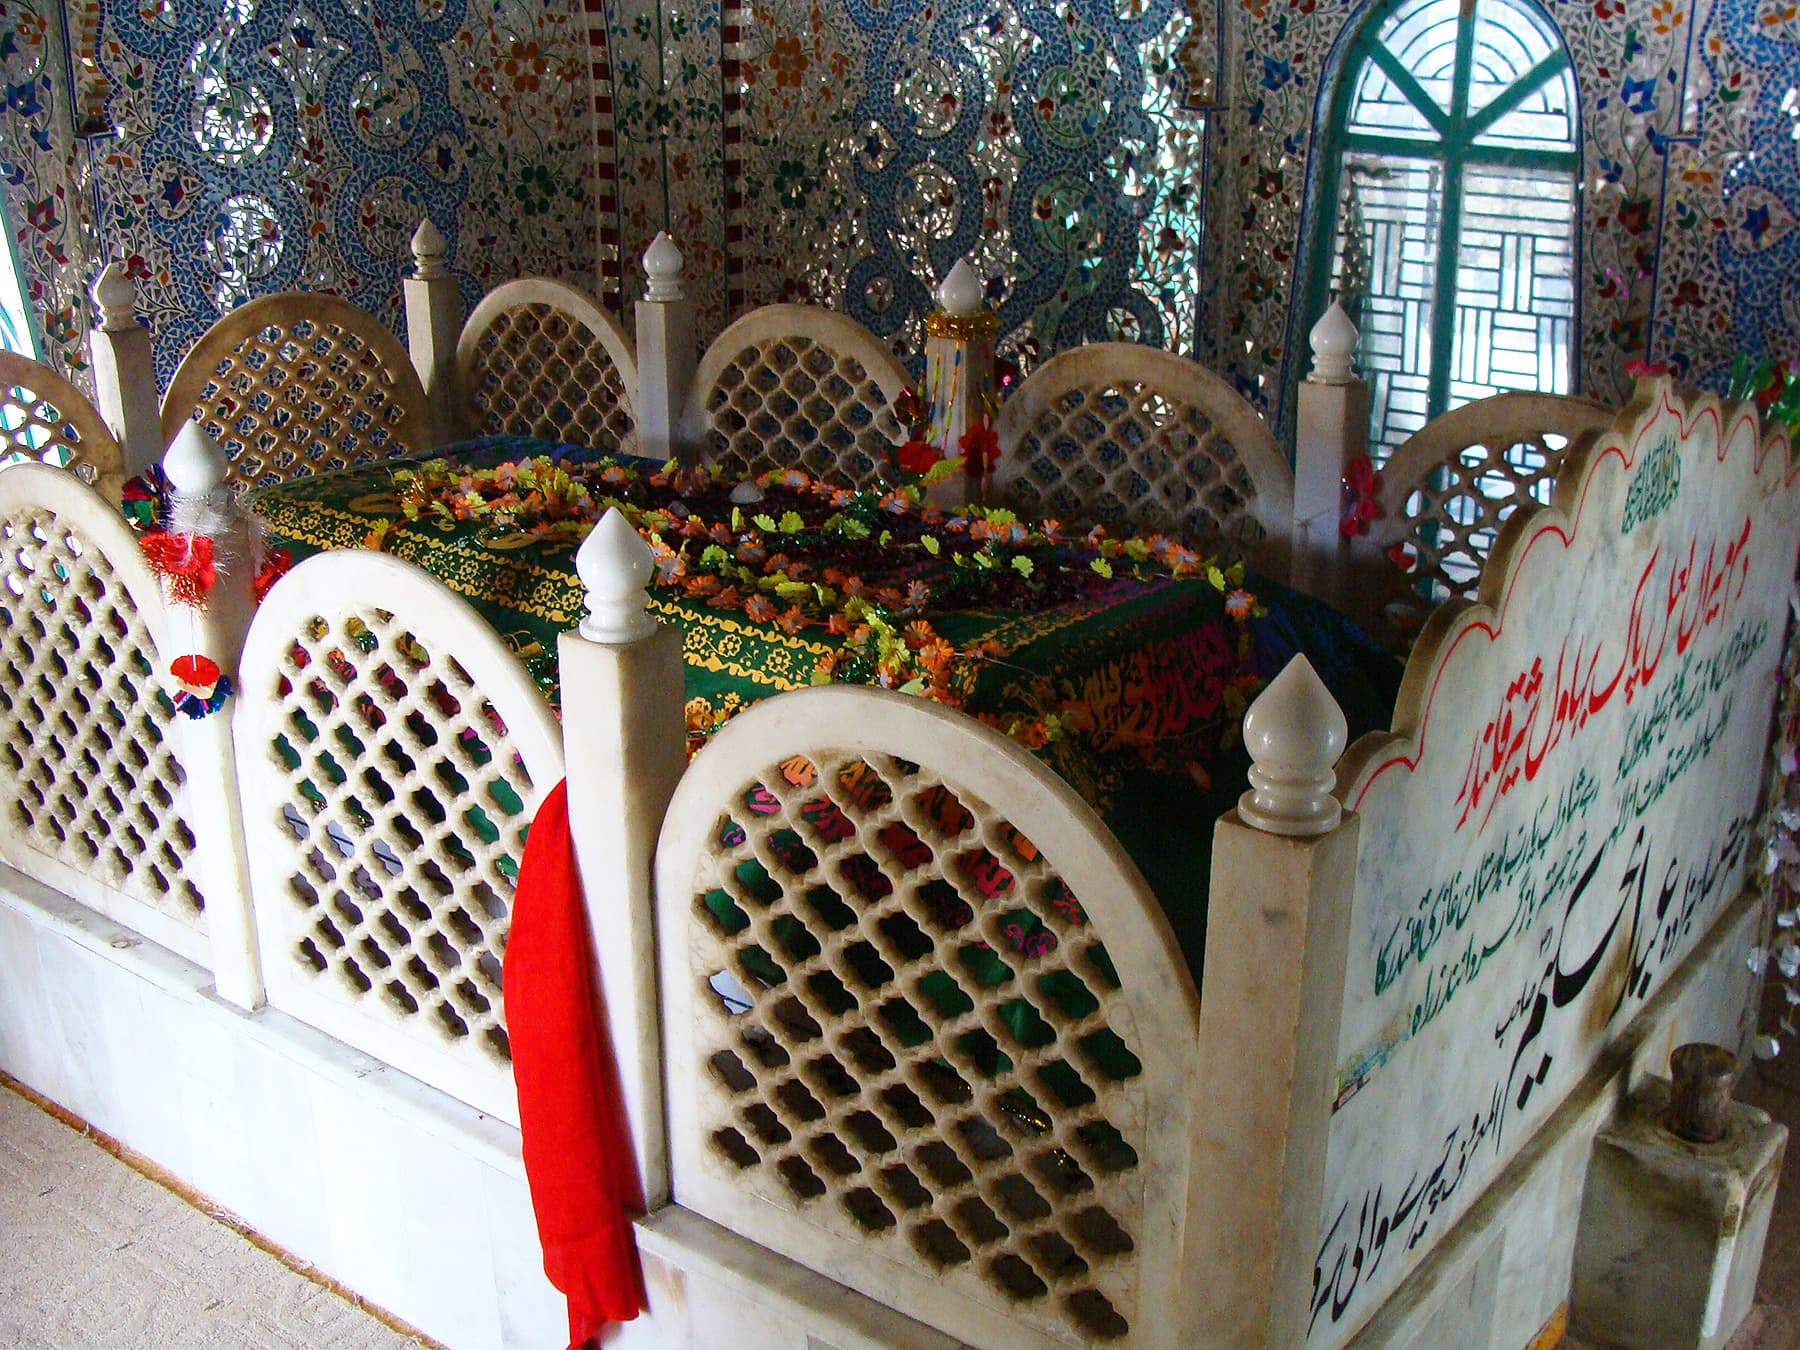 The grave of Abdul Hakeem.